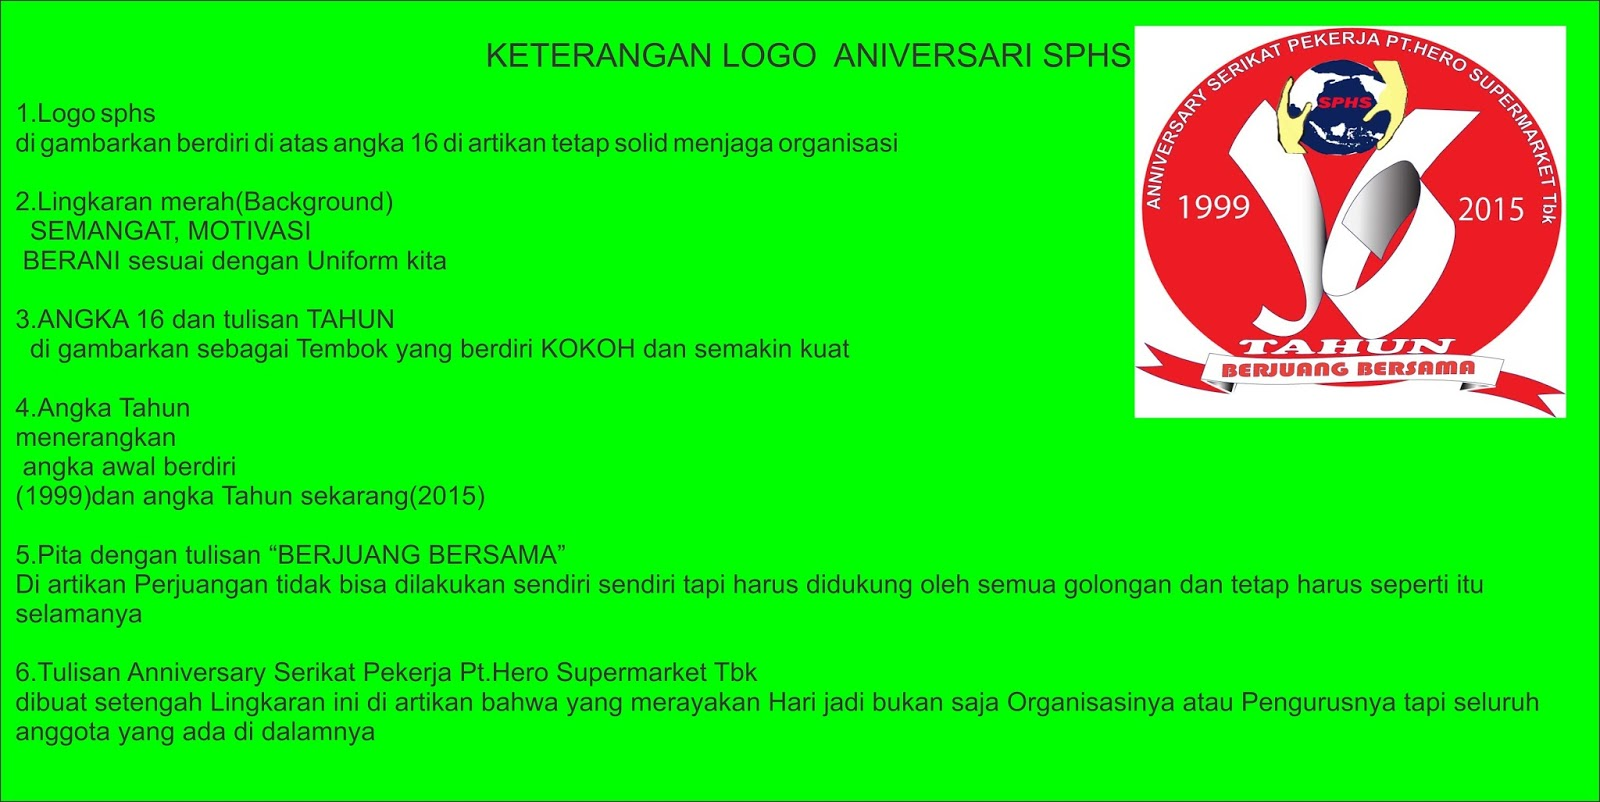 serikat pekerja pt hero supermarket tbk logo hut serikat